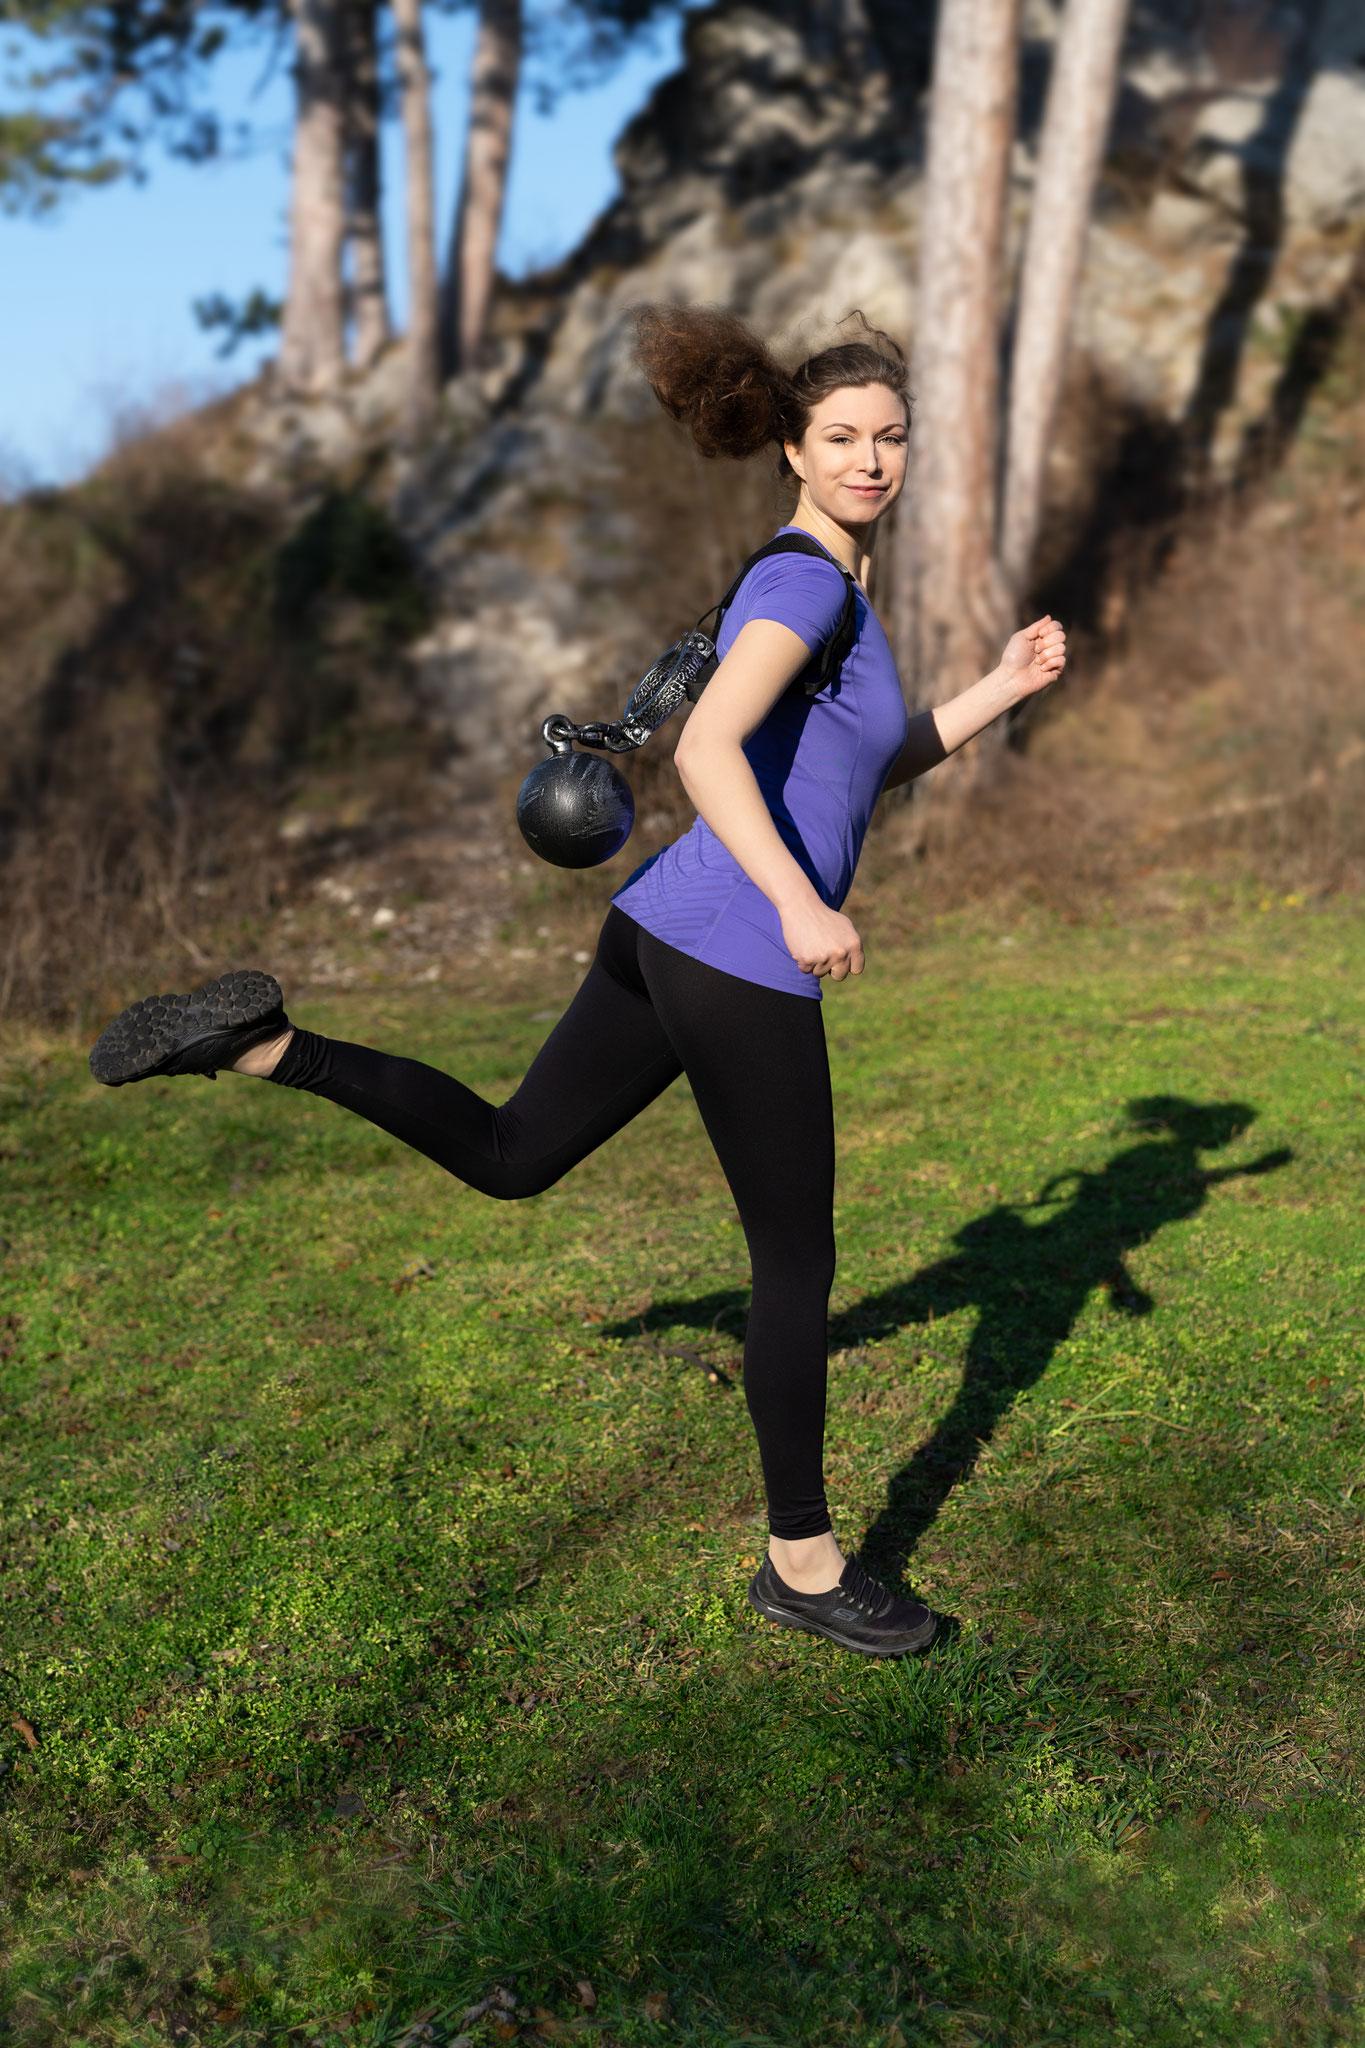 LATISSIMA - Gerade bei der Jogging-Runde…